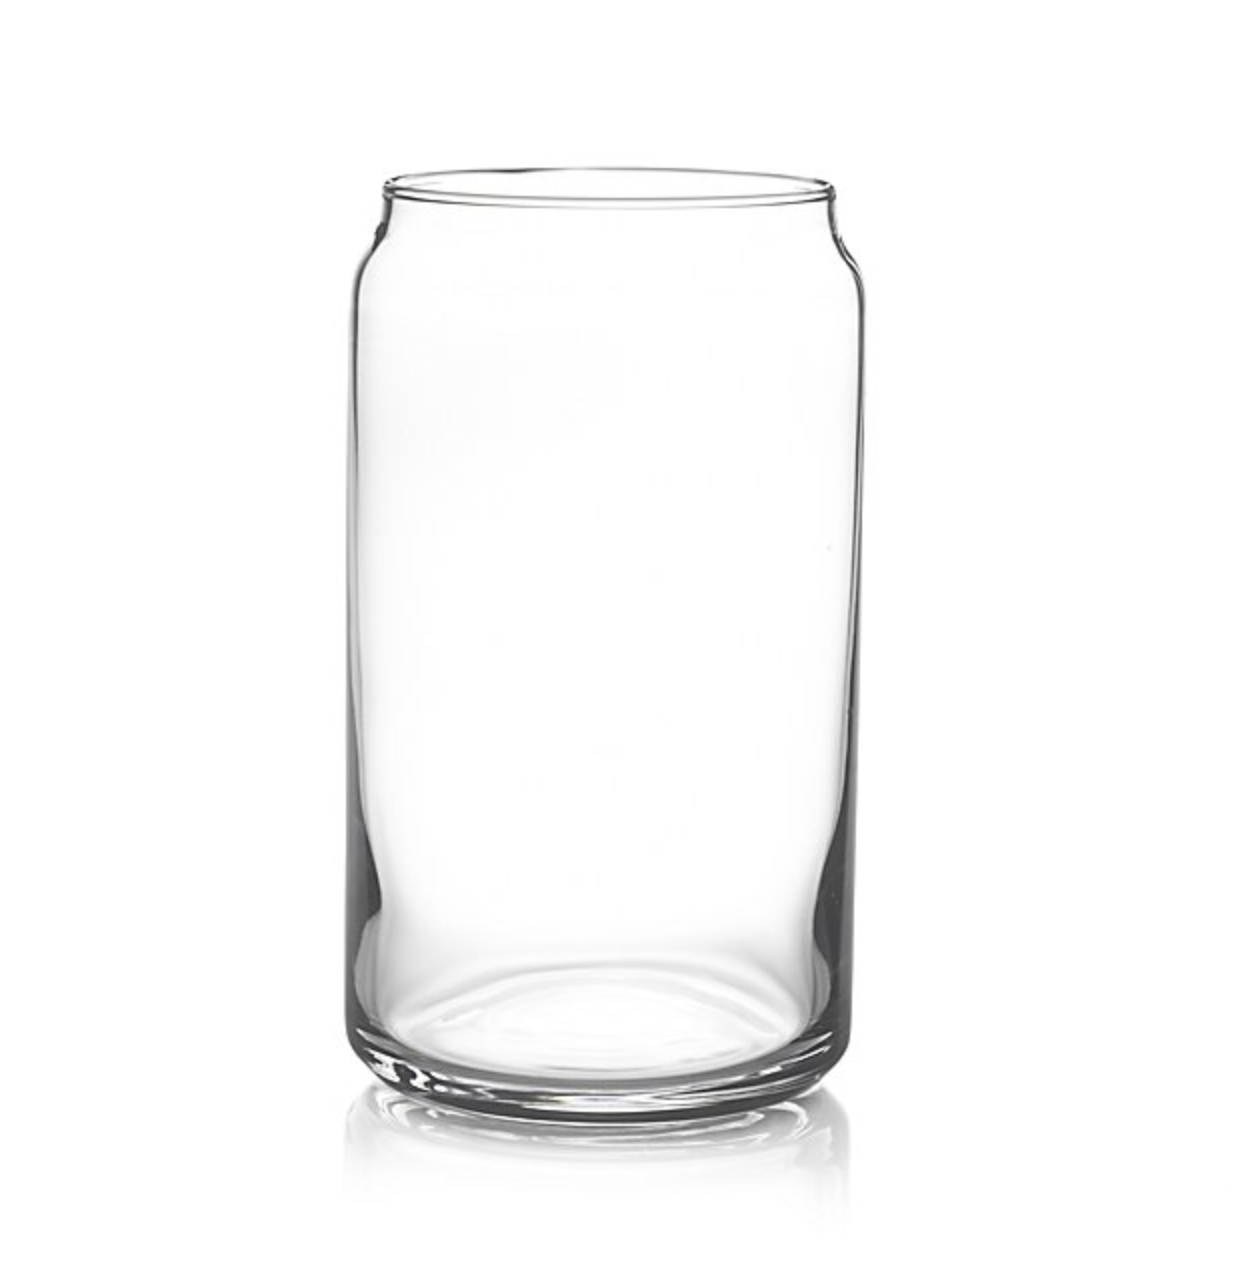 Crate & Barrel Soda Can Glass